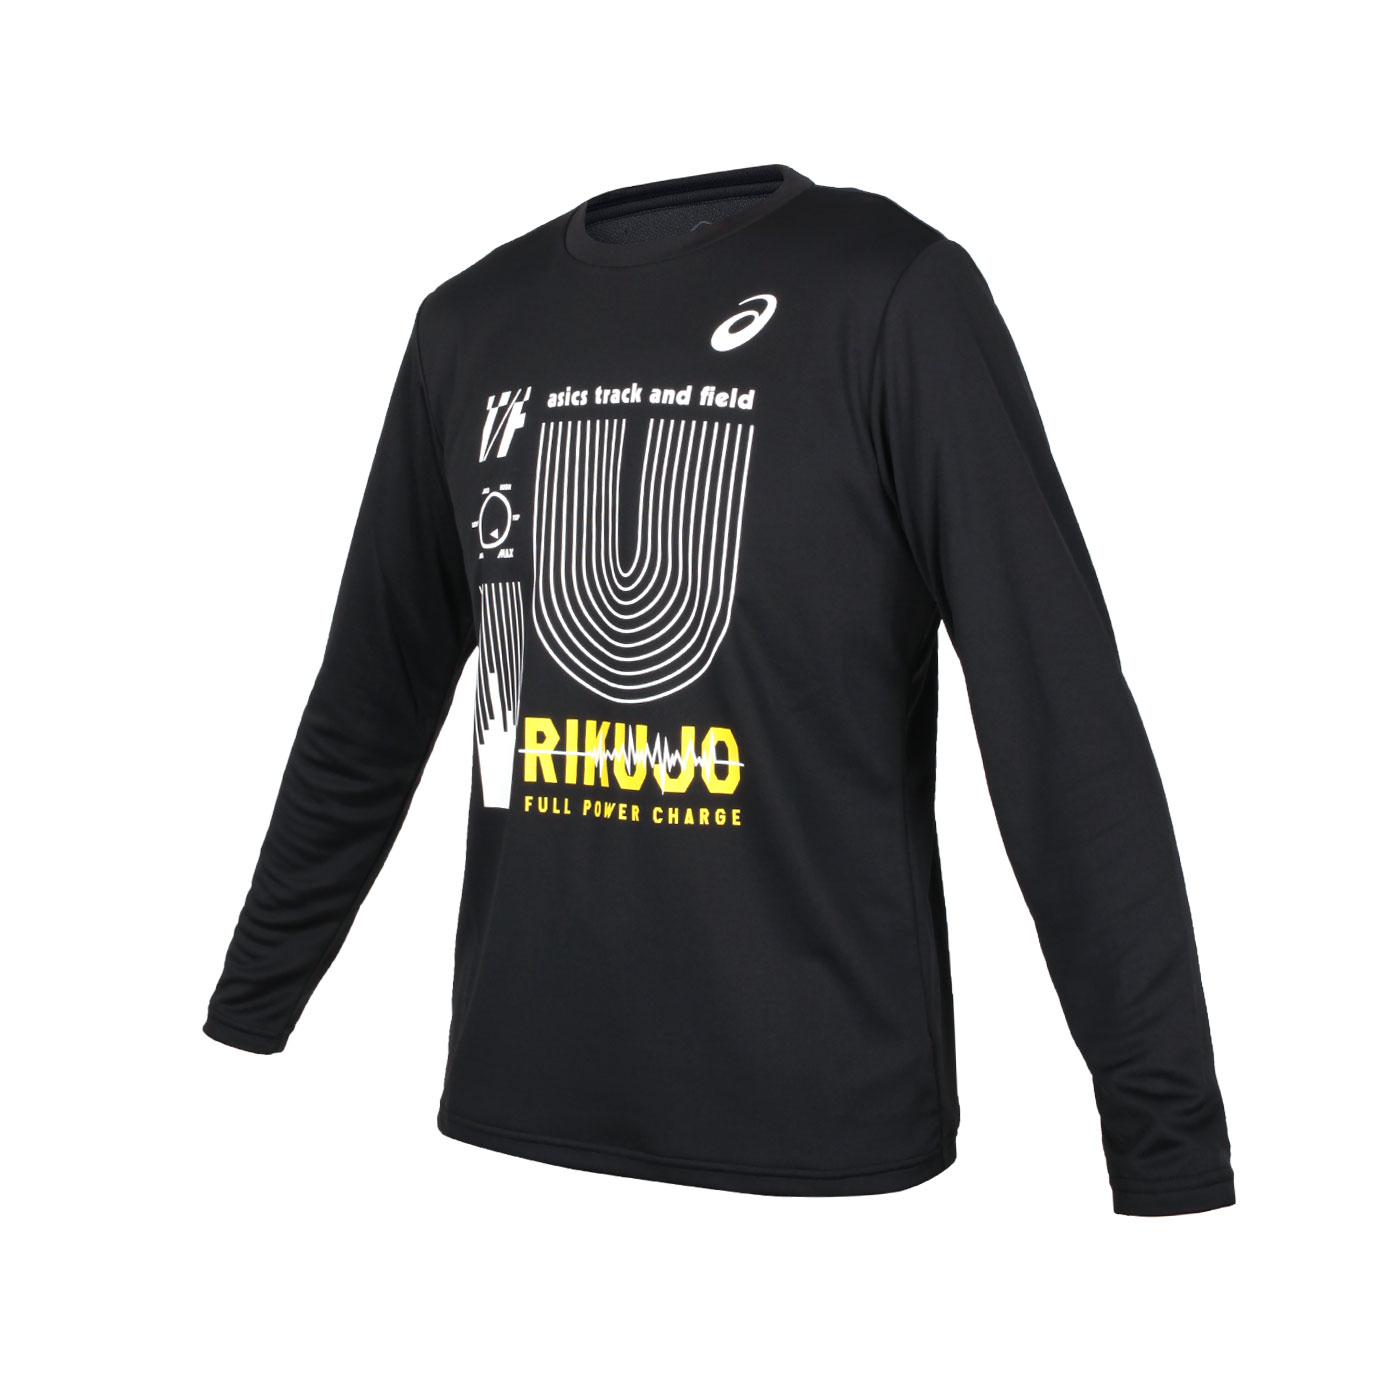 ASICS 男款長袖T恤 2091A450-002 - 黑白黃